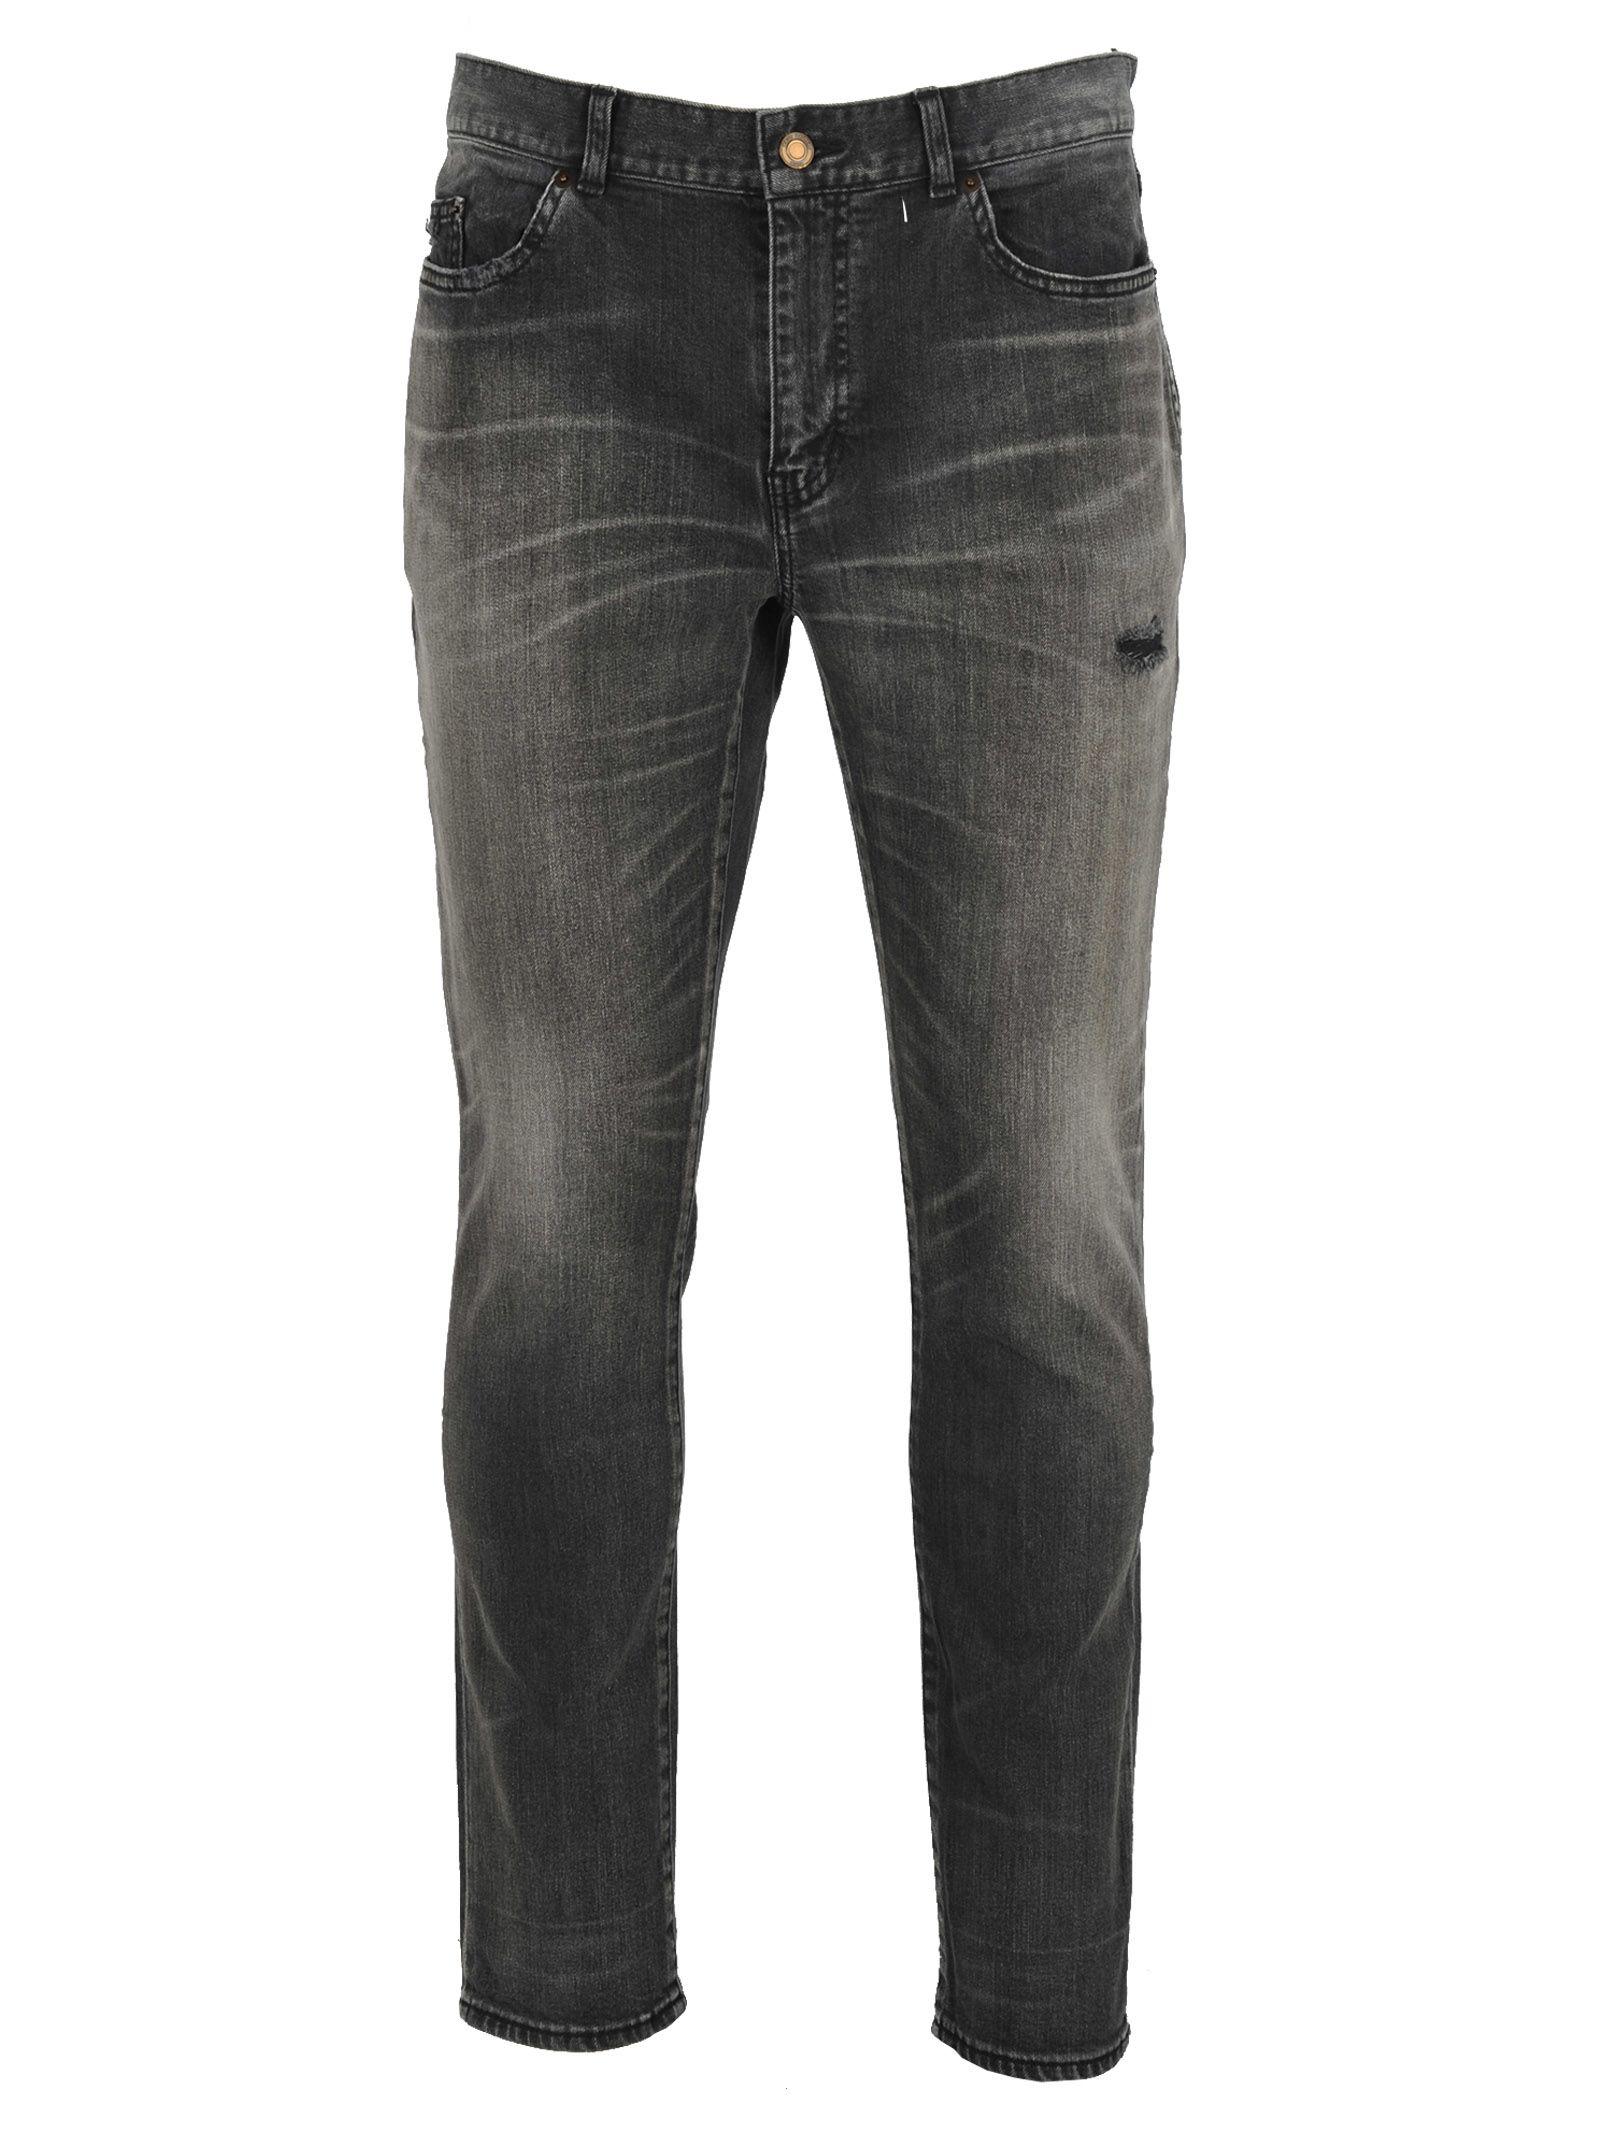 94b461b9120d7 Saint Laurent 15Cm Skinny Cotton Denim Jeans In Black